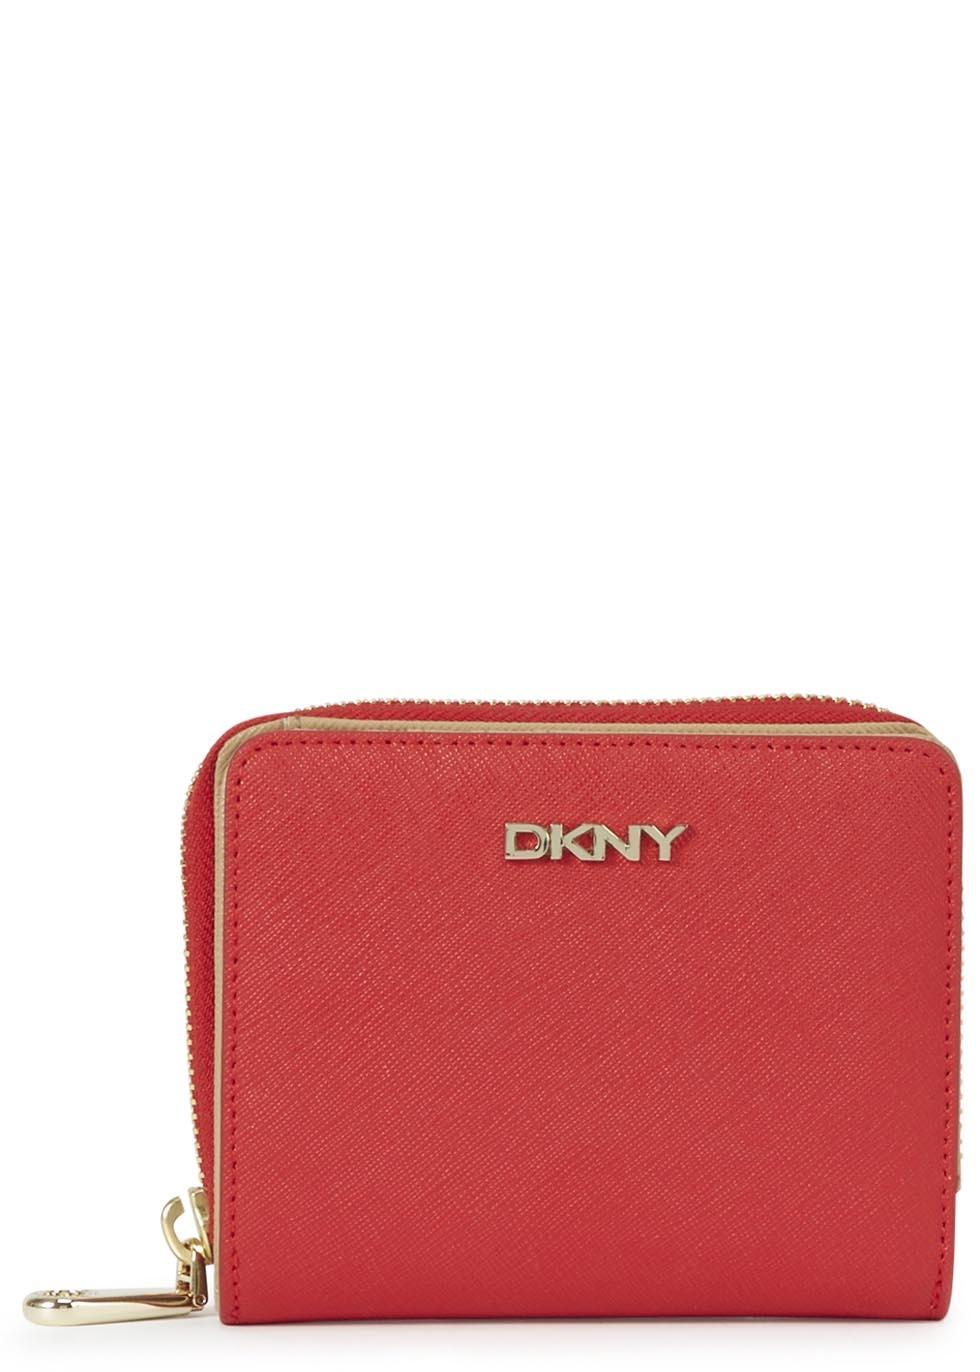 DKNY Black R3326507 Saffiano Women's Zip Around Wallet |Dkny Wallet